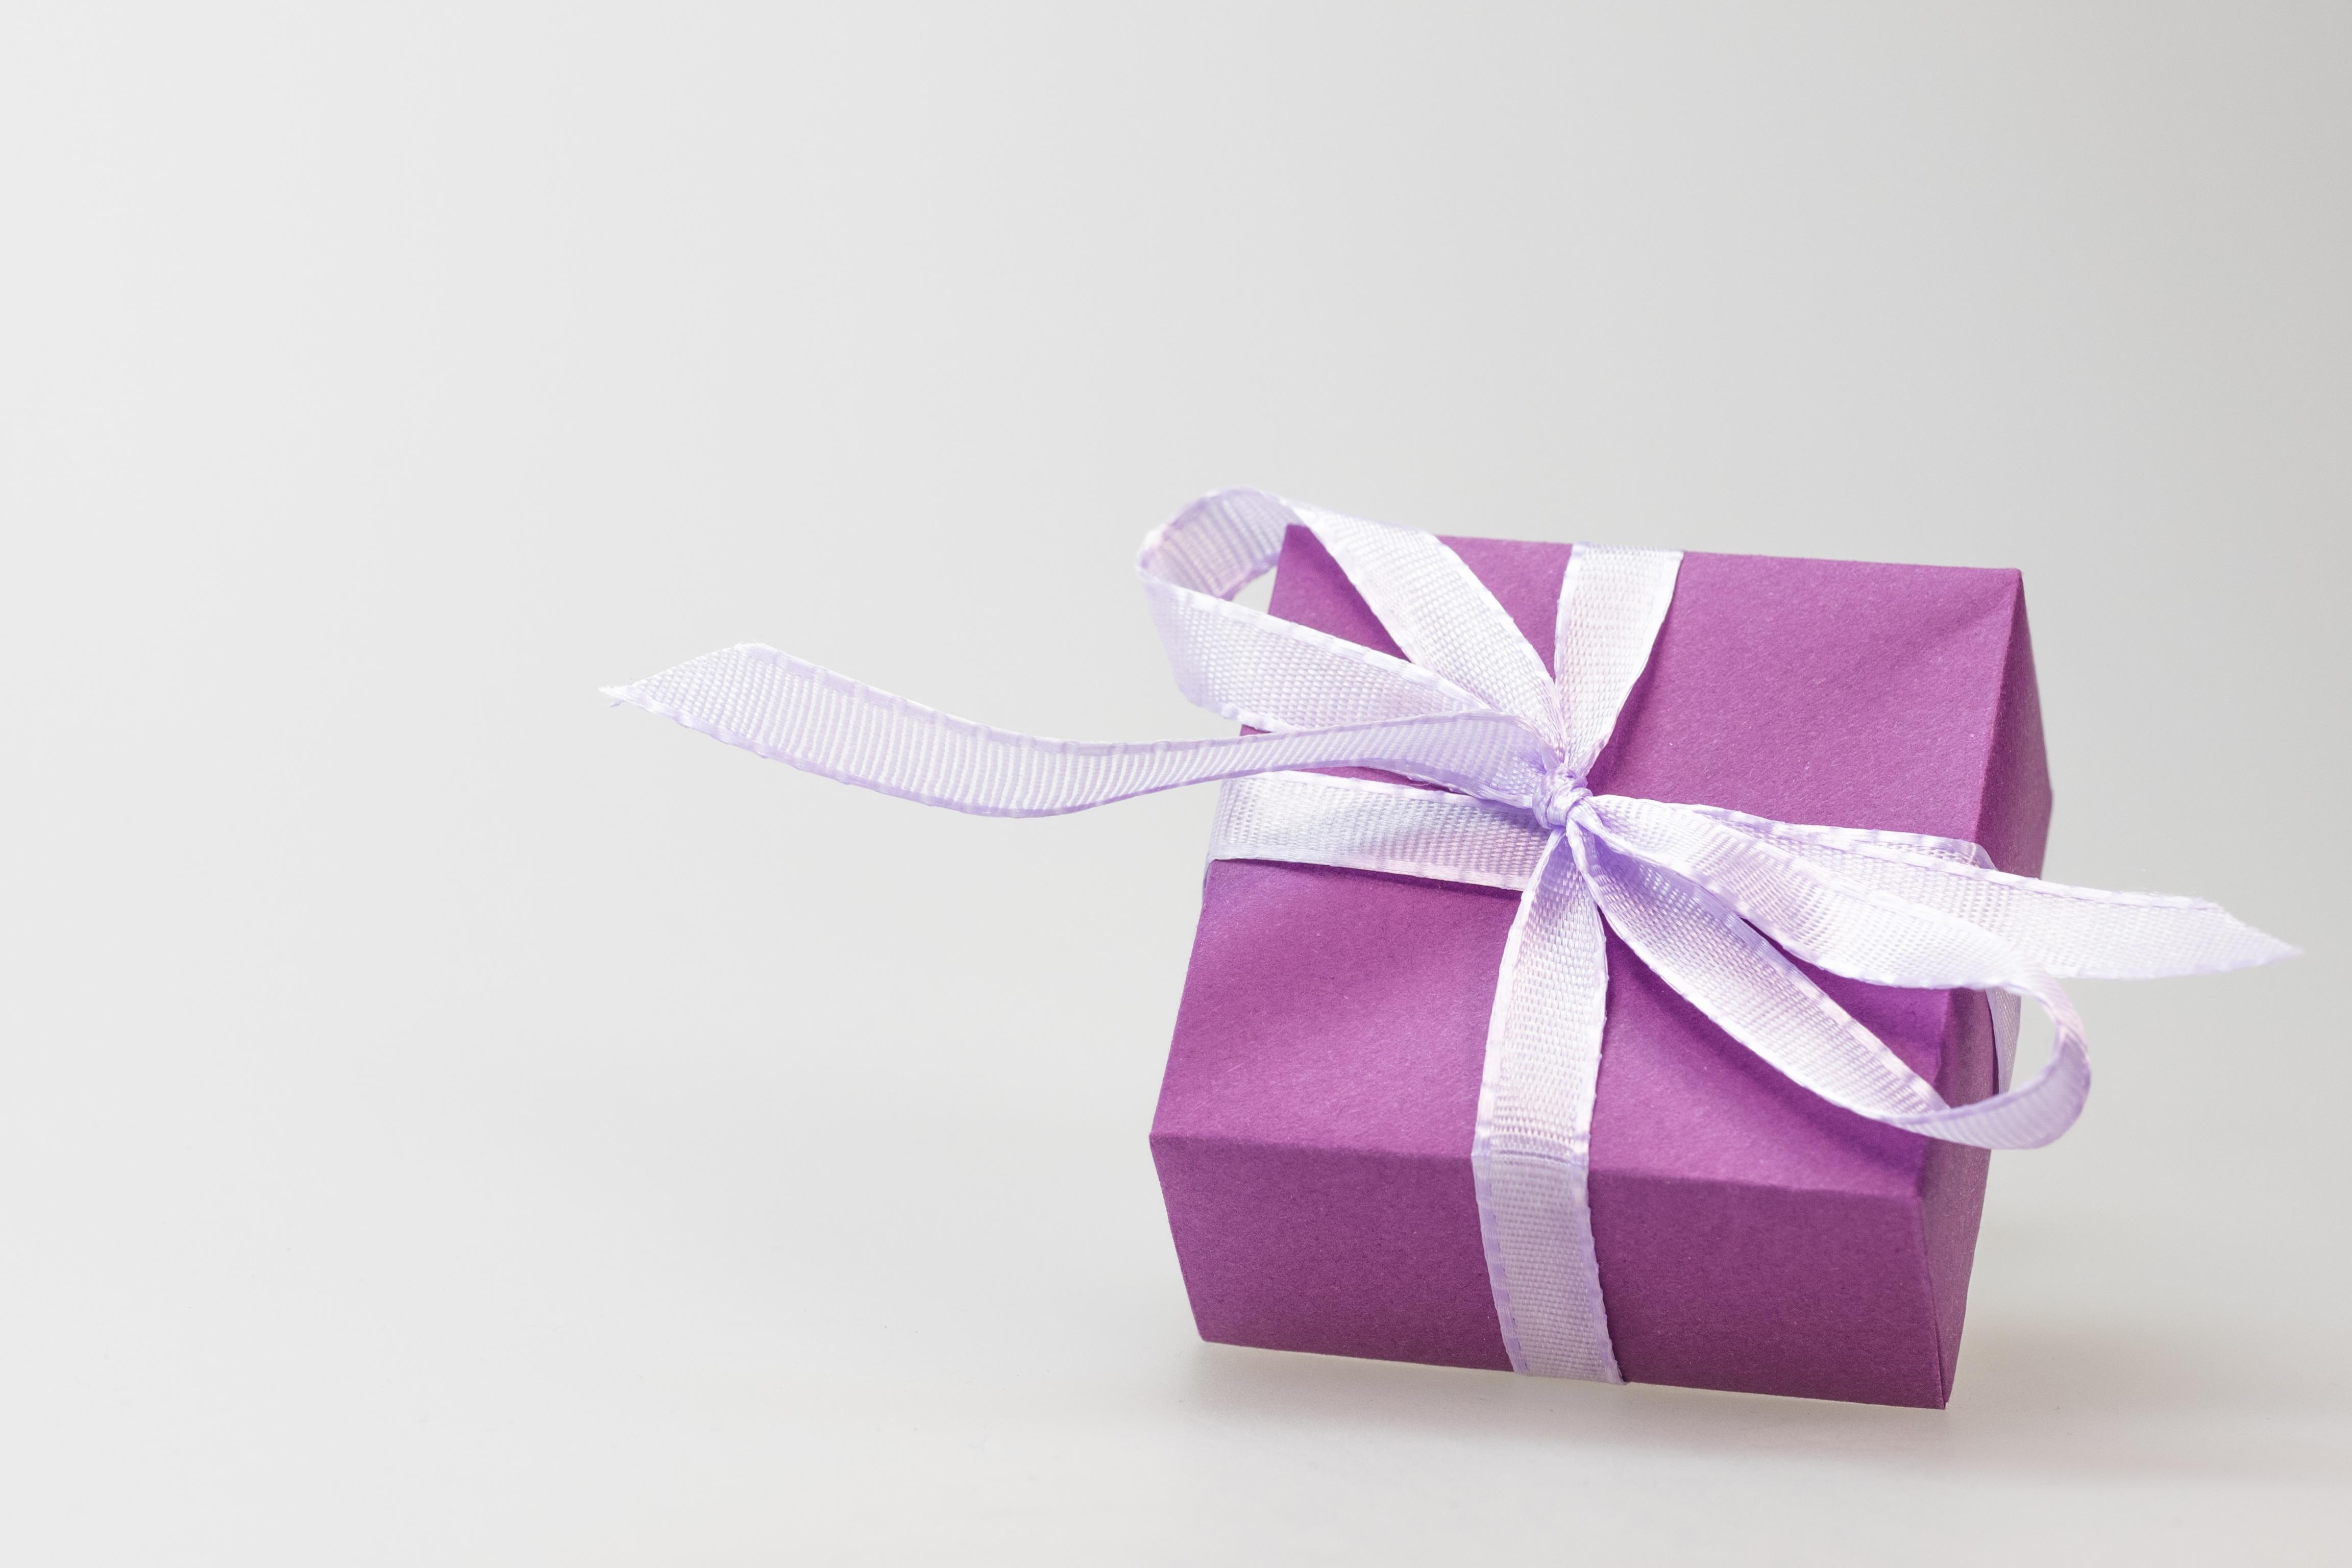 Free stock photos of present pexels free stock photo of purple gift present box negle Choice Image